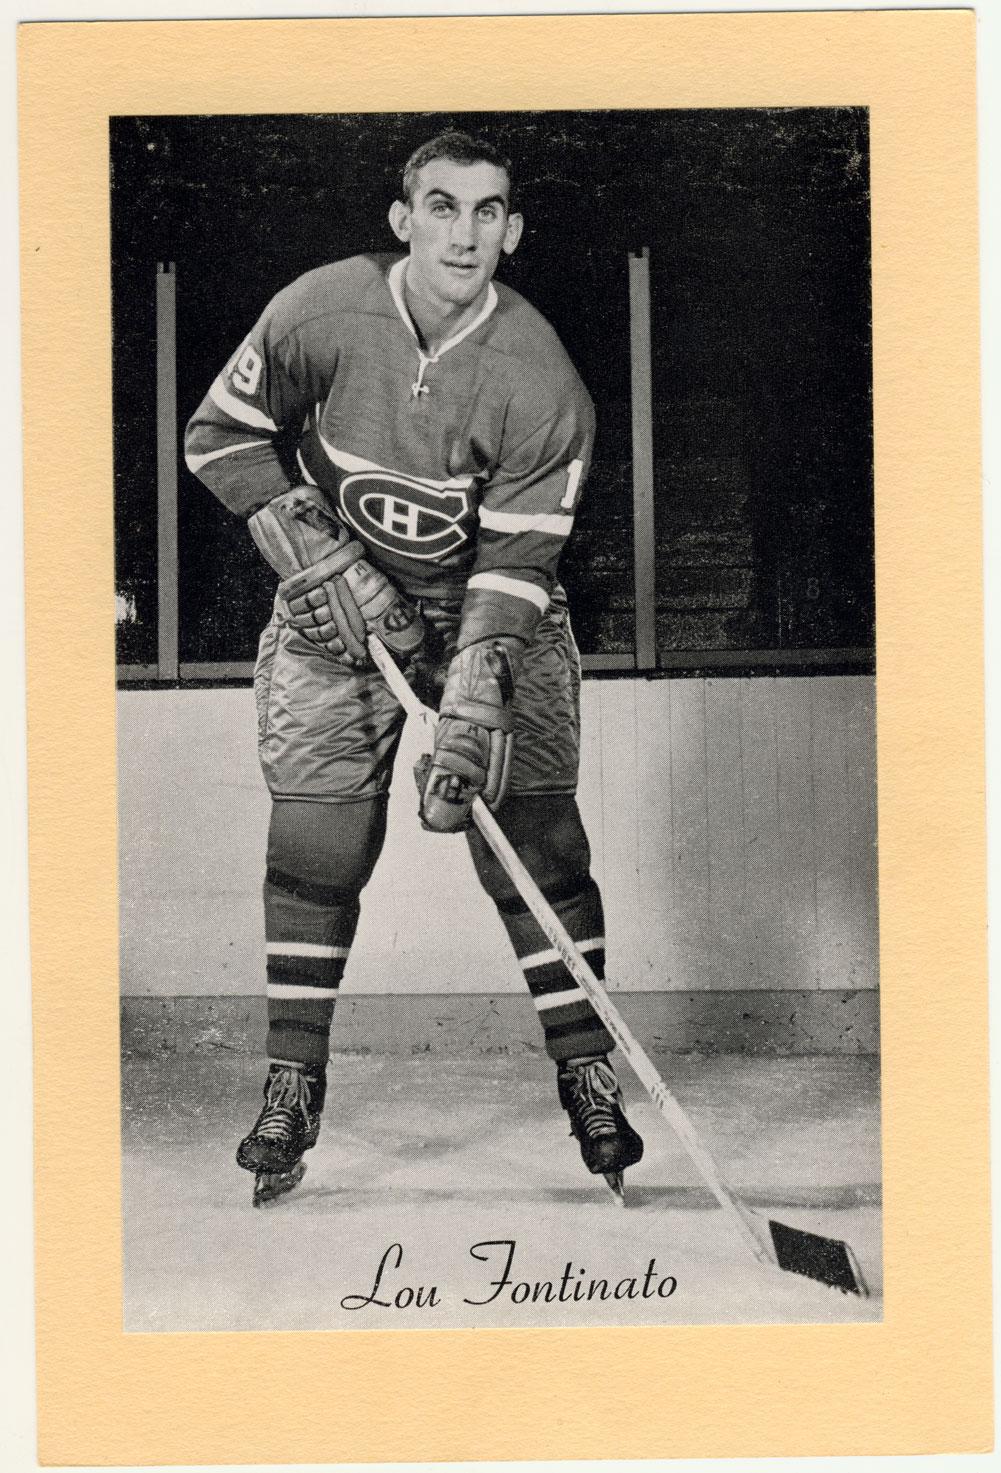 Lou Fontinato